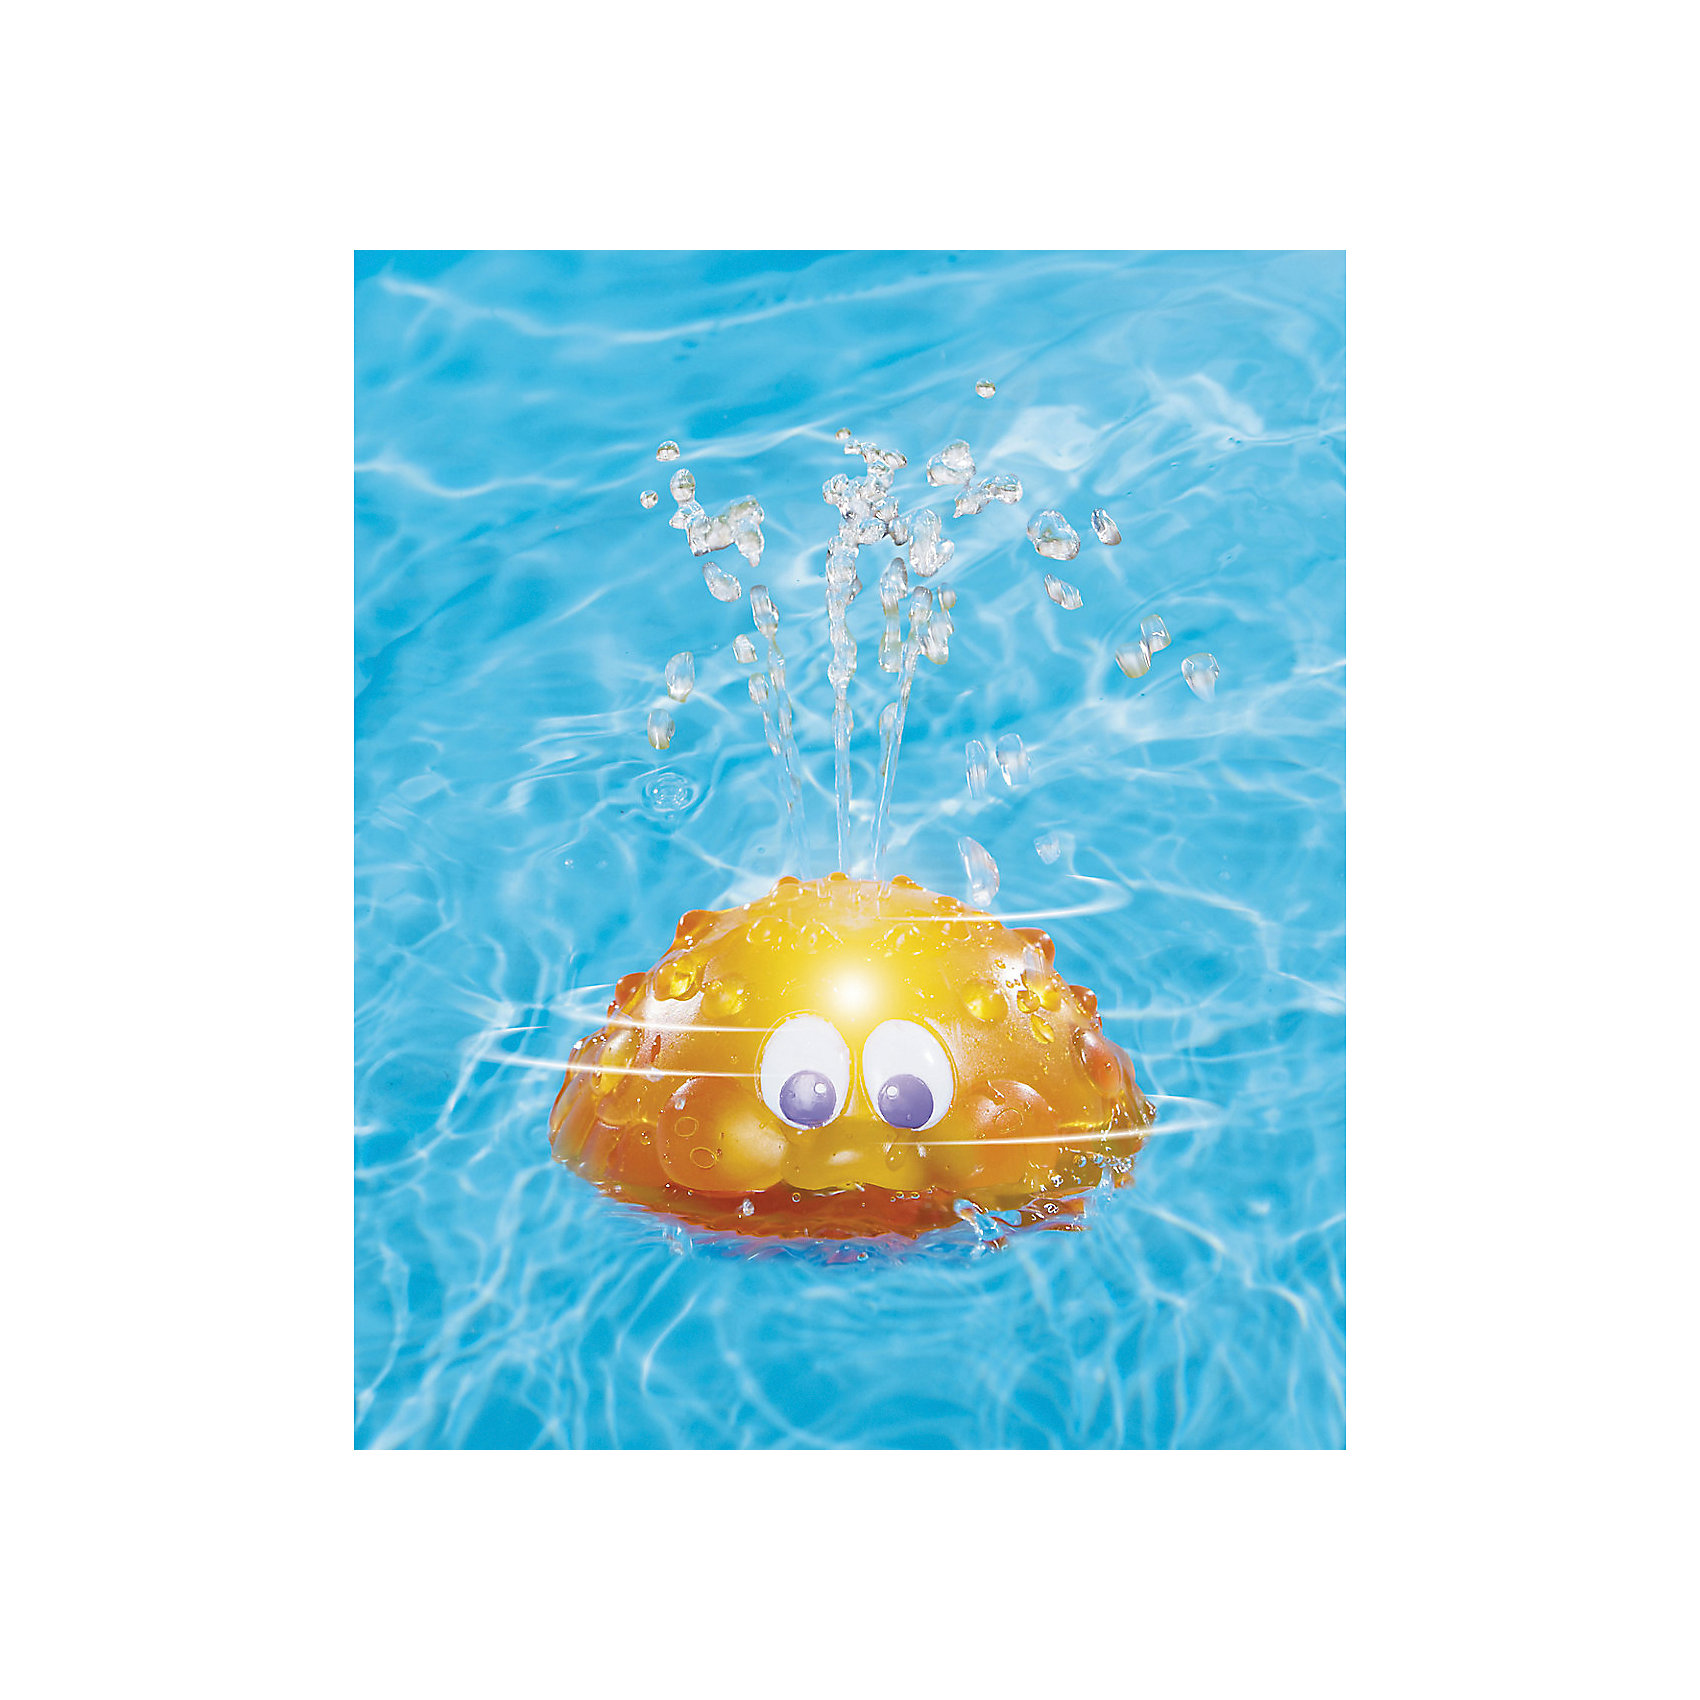 Little Tikes Игрушка для ванны Вращающийся фонтан, Little Tikes, жёлтый little tikes матрас для пеленания little tikes